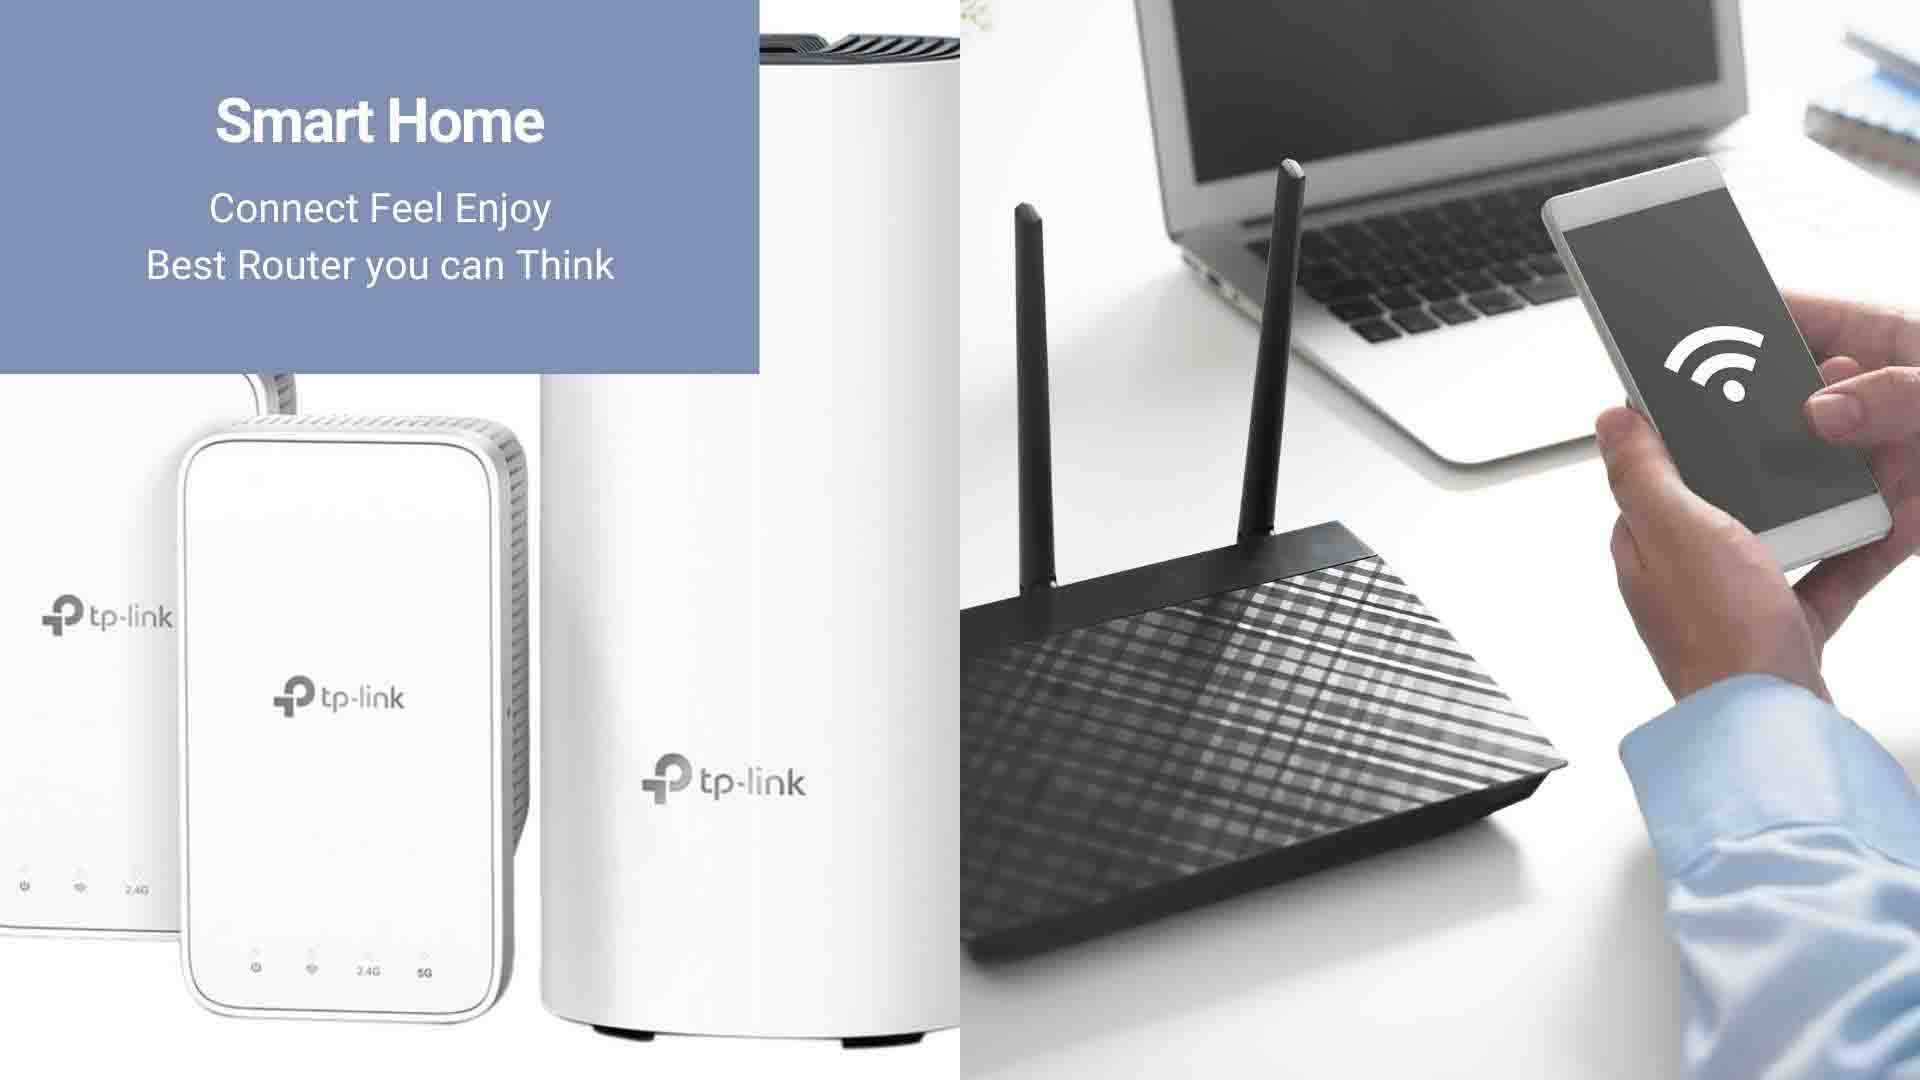 HOT TP-Link Deco Mesh WiFi System tp-link deco m3 Best Review